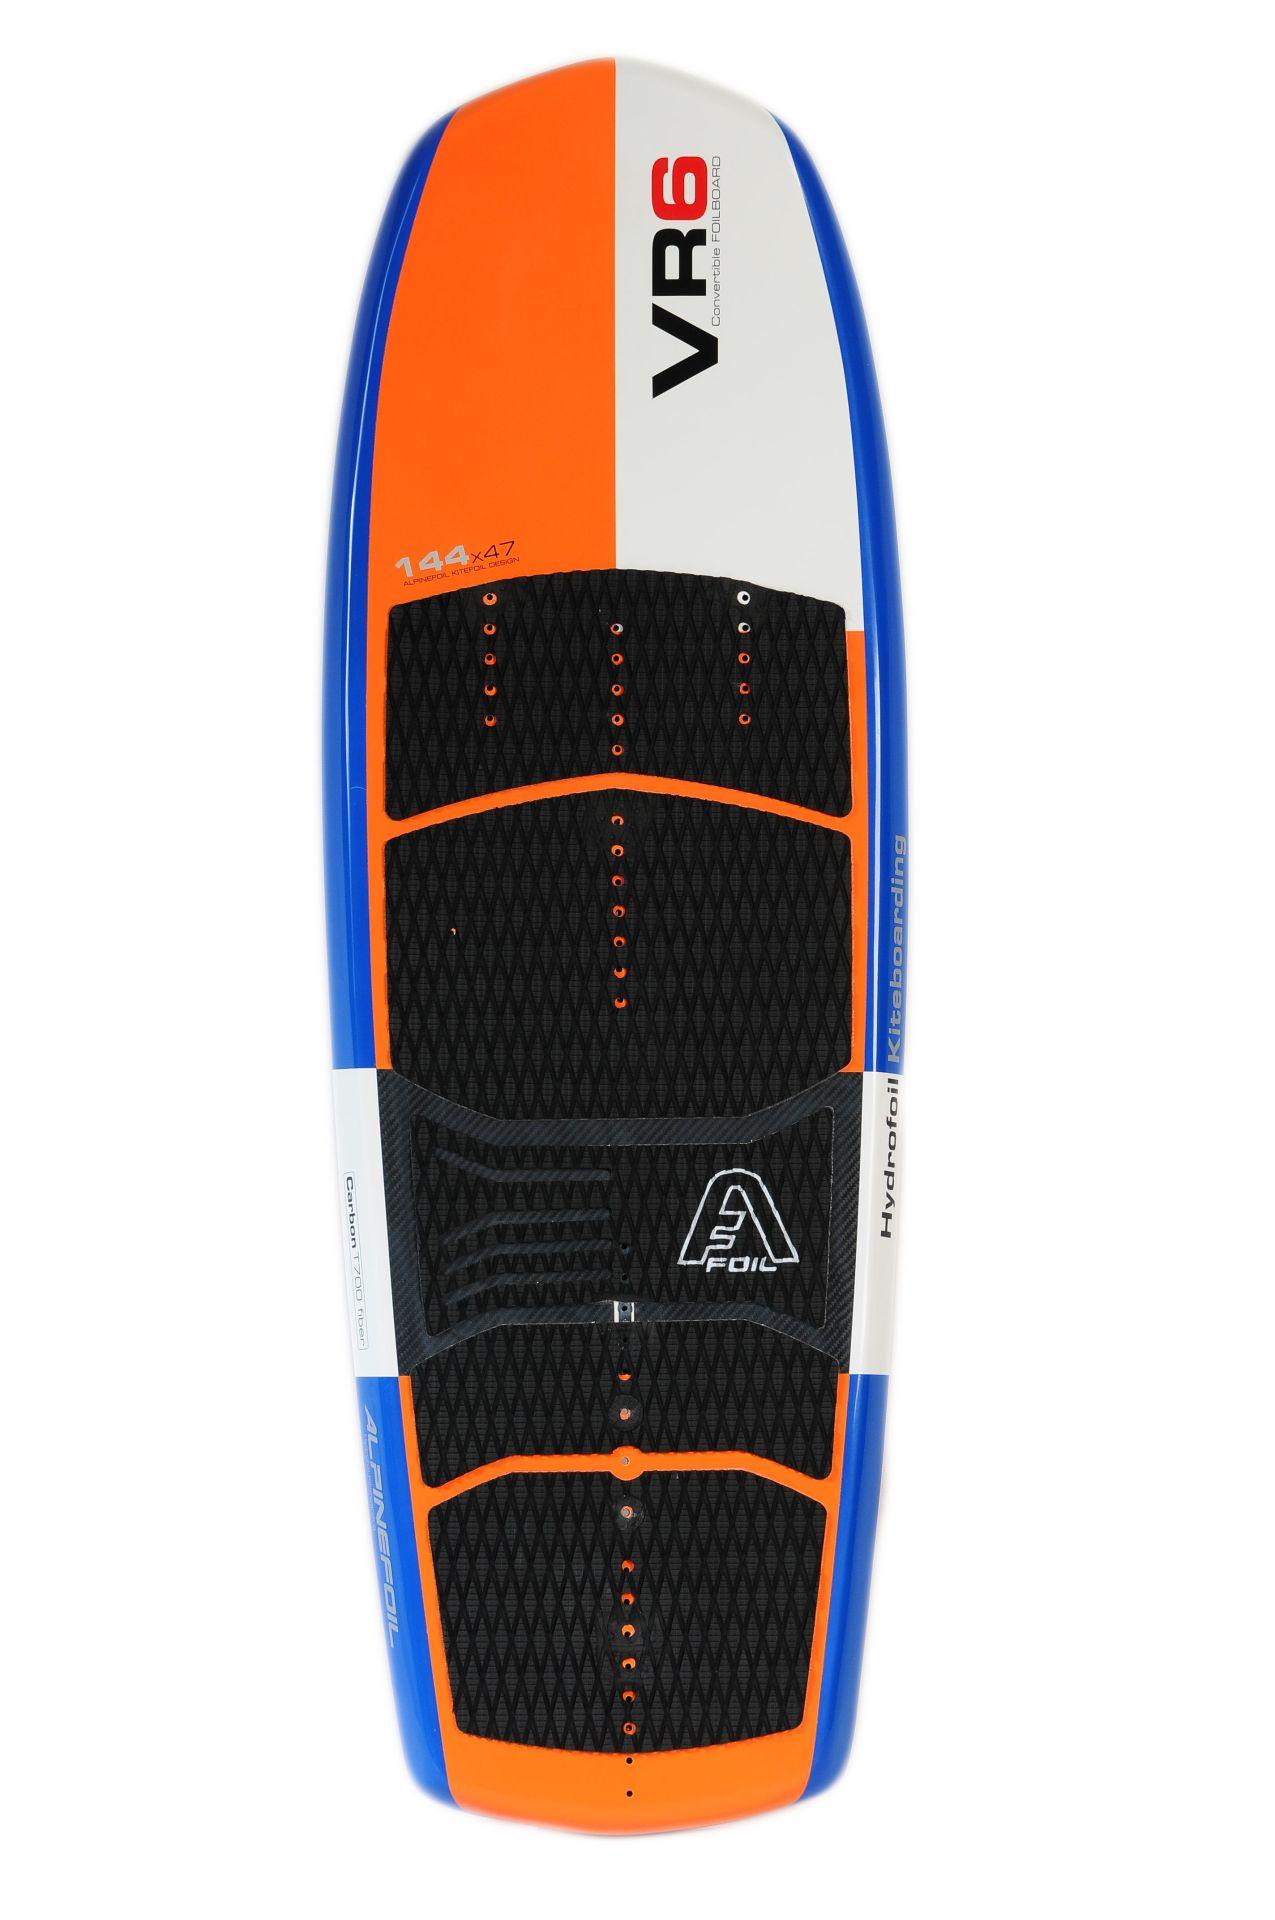 Kitefoil foilboard alpinefoil vr6 5 2